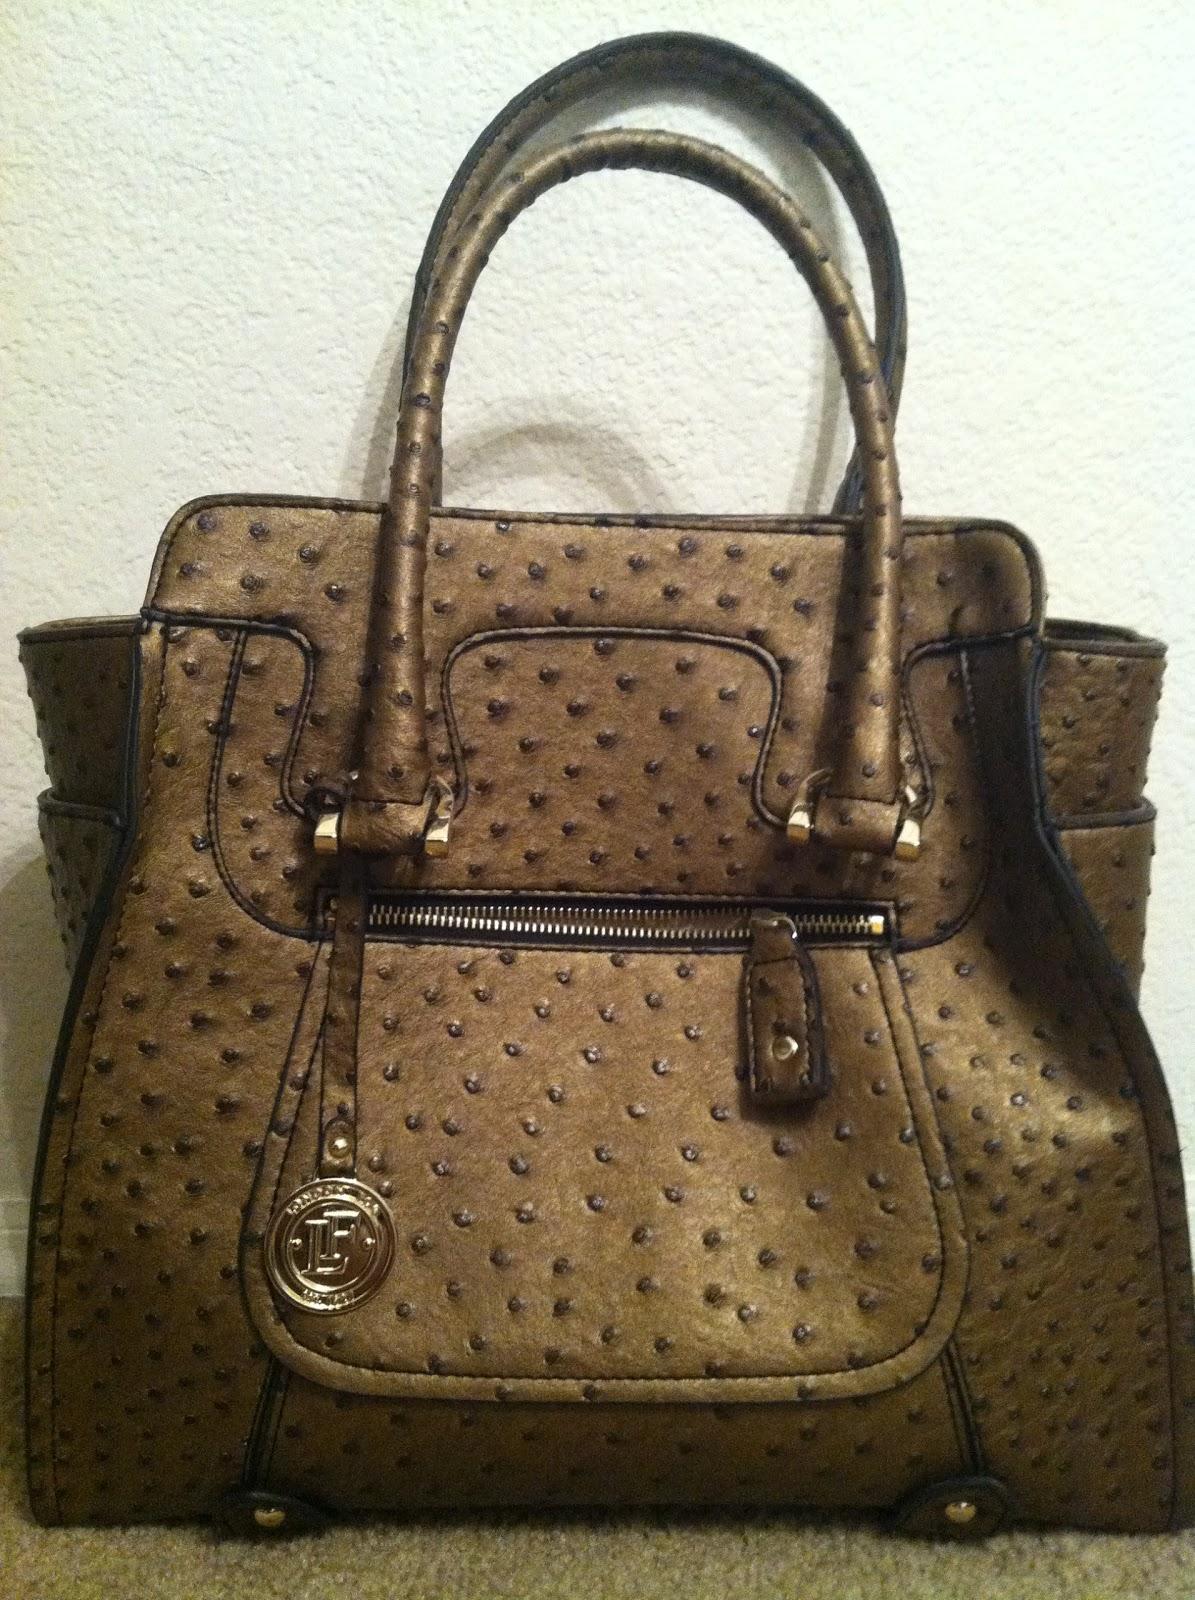 hermes birkin inspired handbags